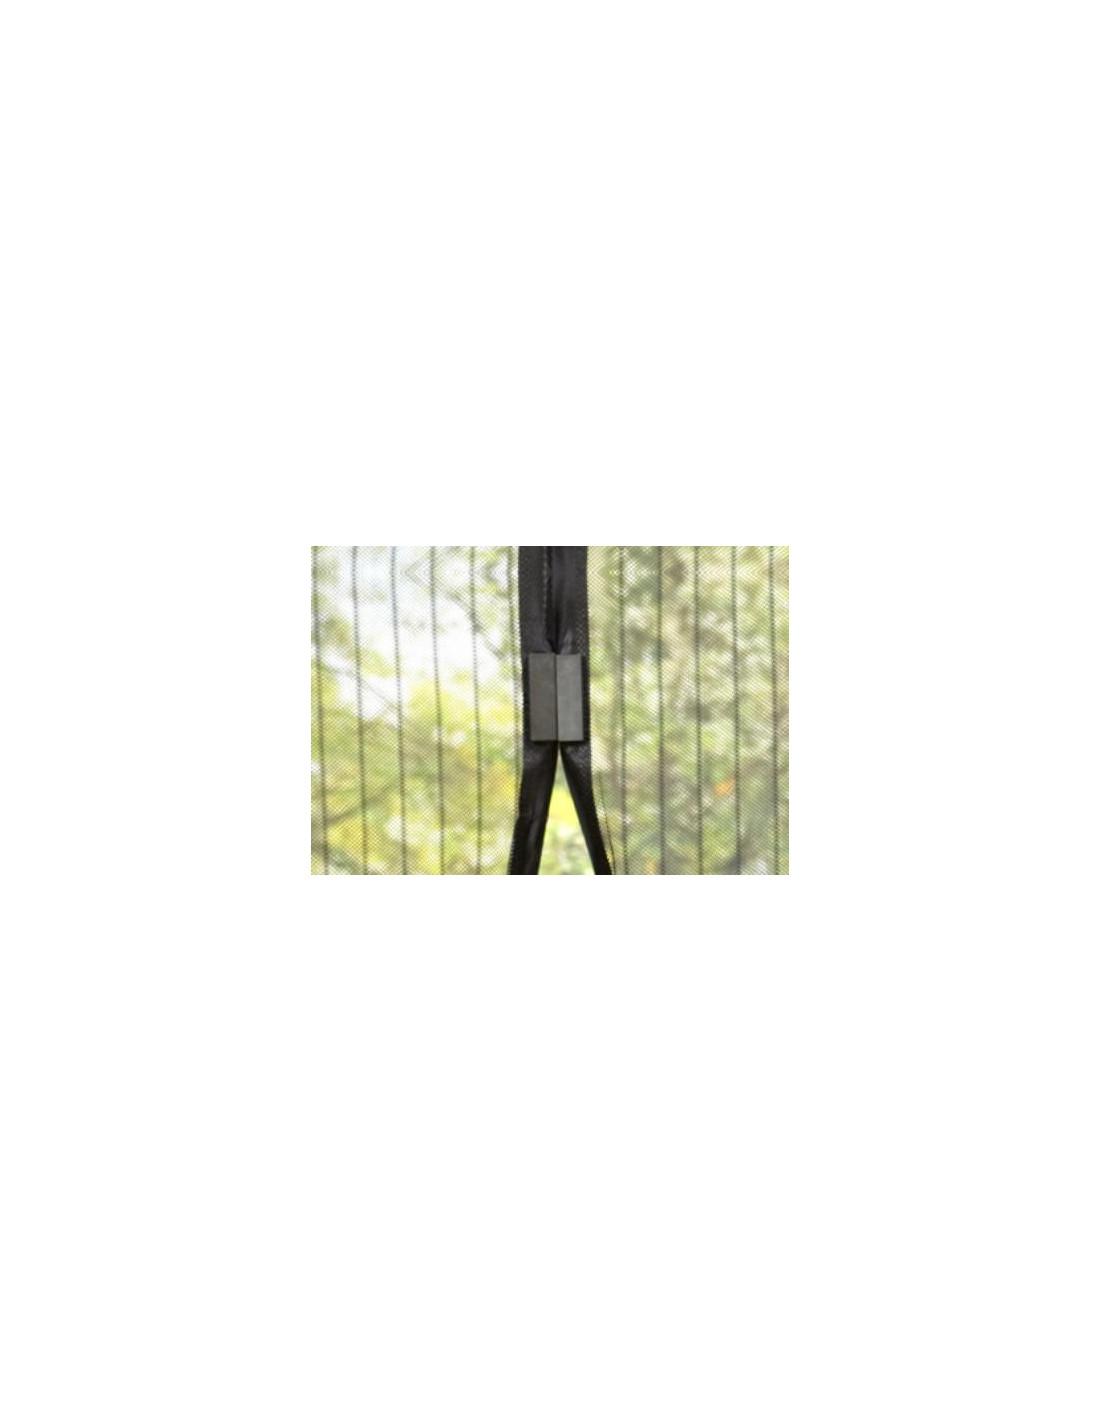 Cortina mosquitera anti insectos para puerta 2und x 50x220 for Cortina mosquitera puerta